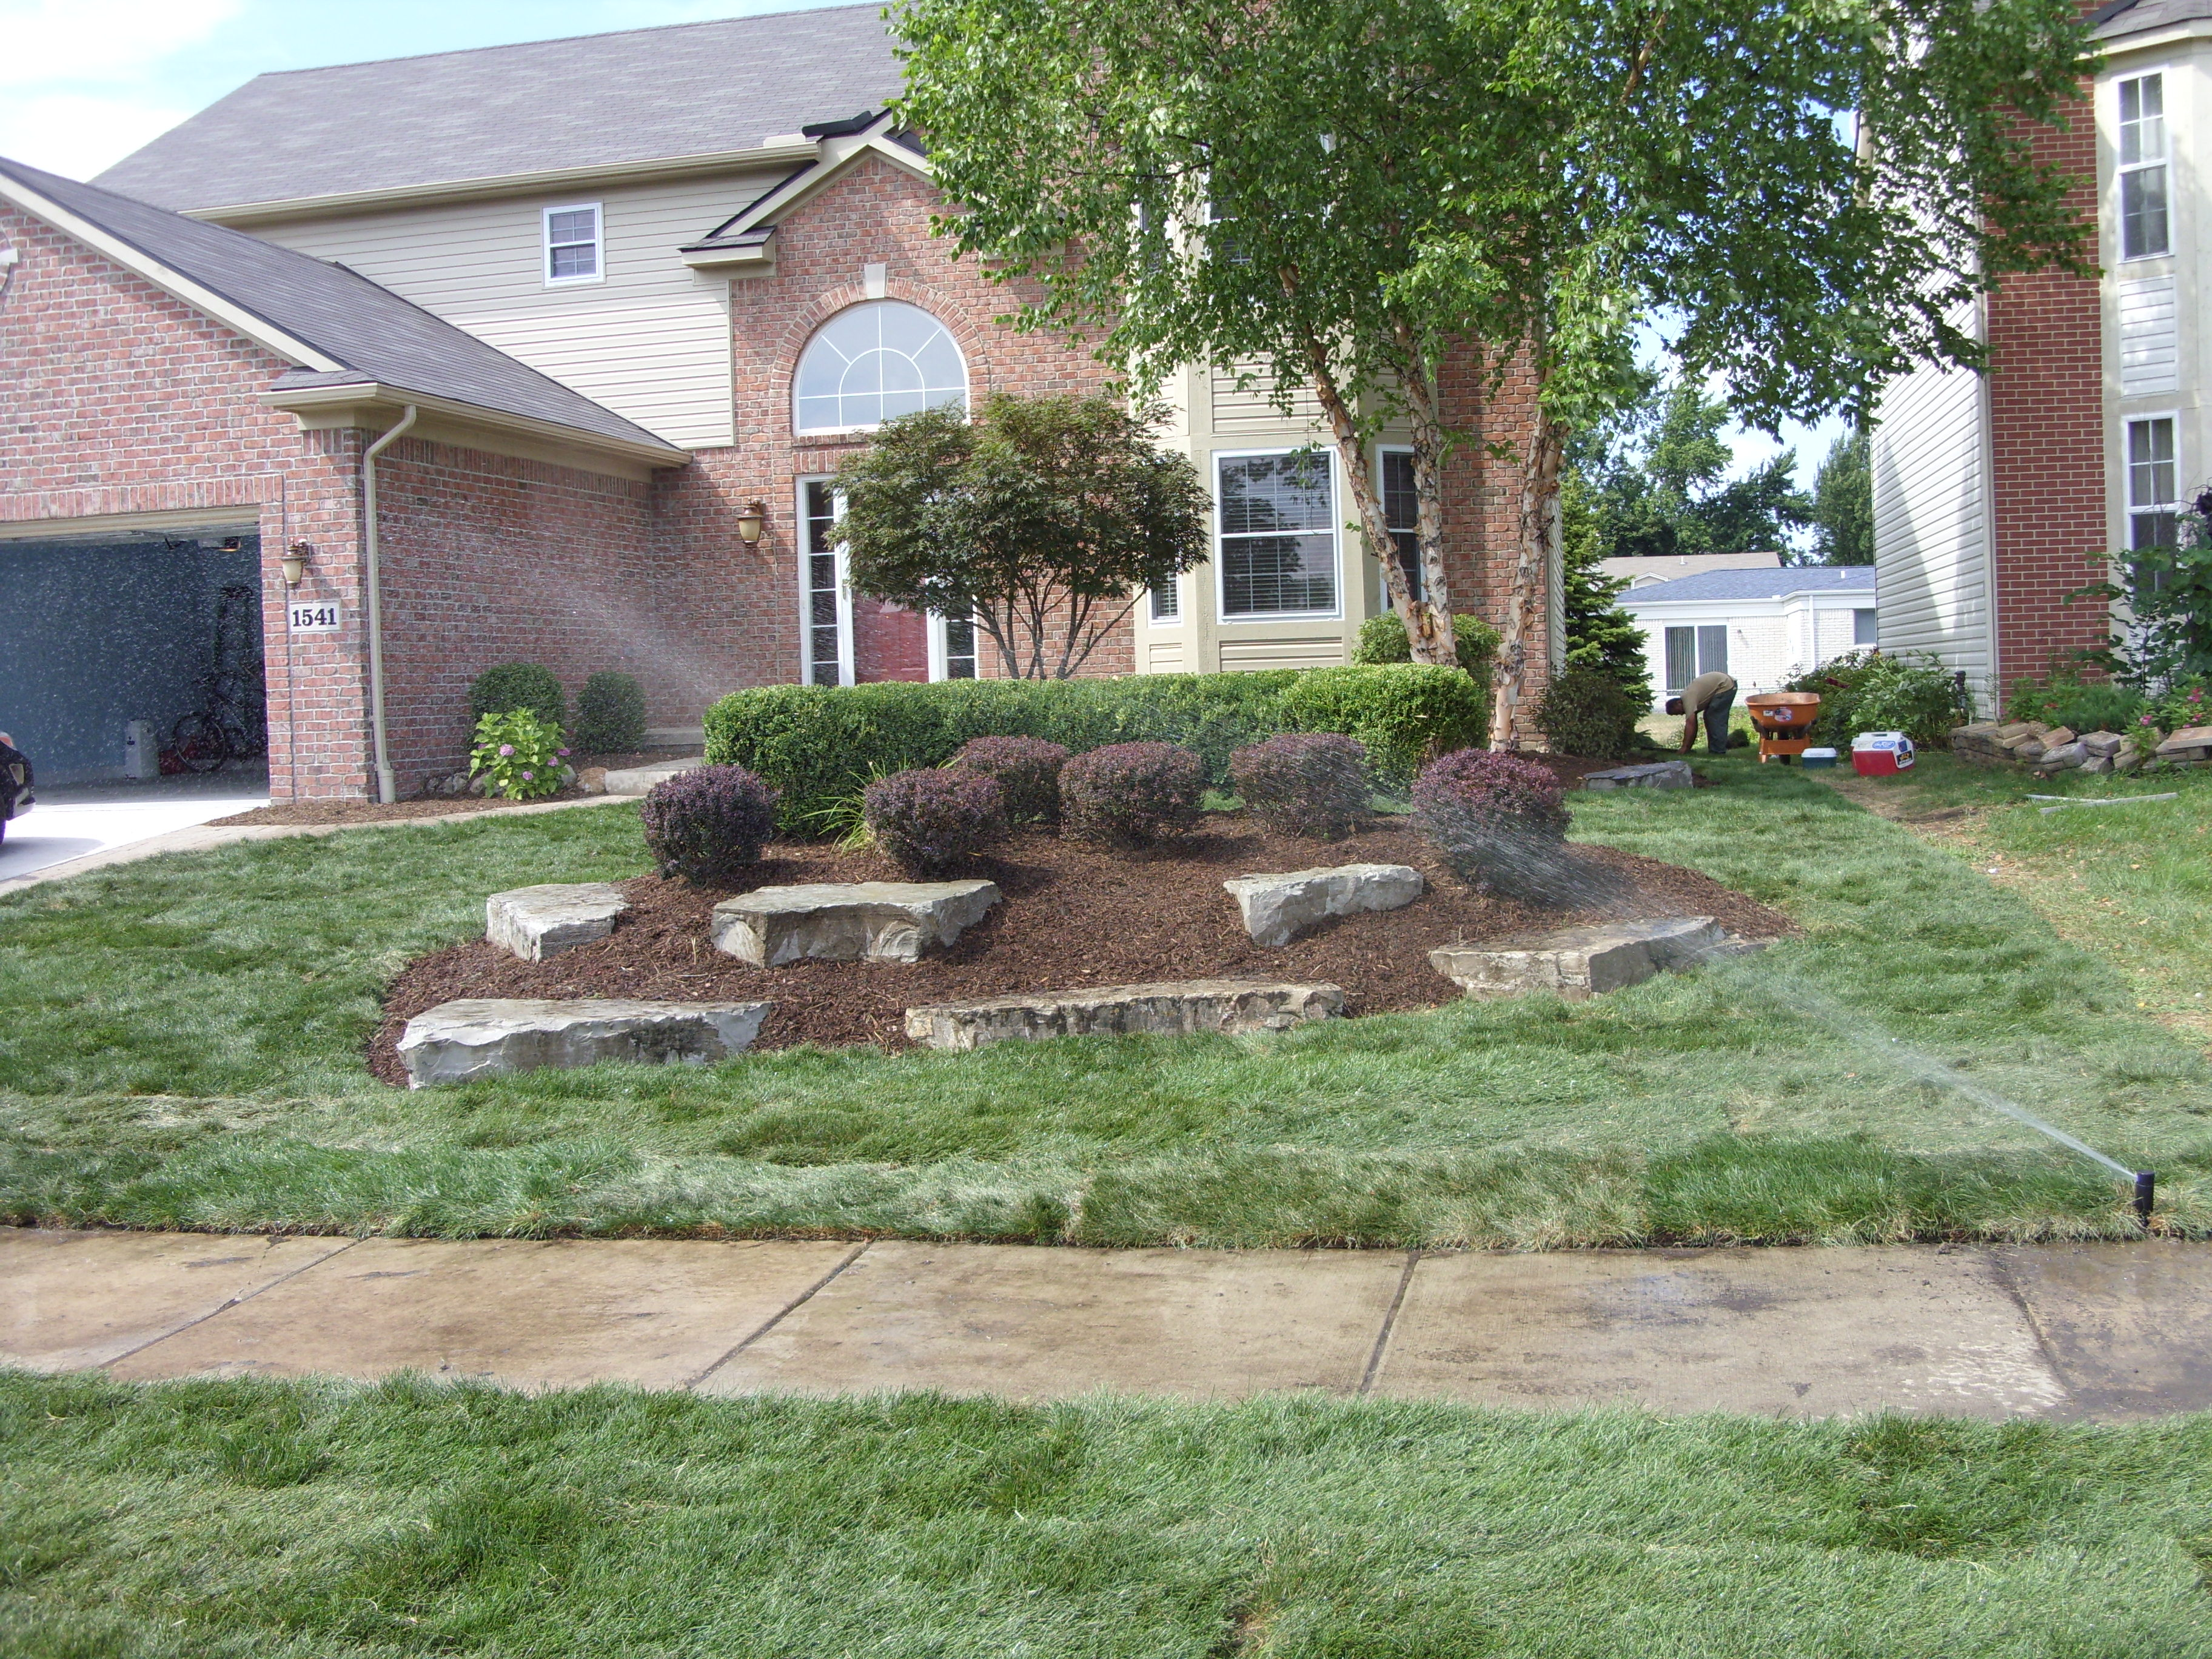 lawn sprinkler total lawn care inc full lawn maintenance lawn